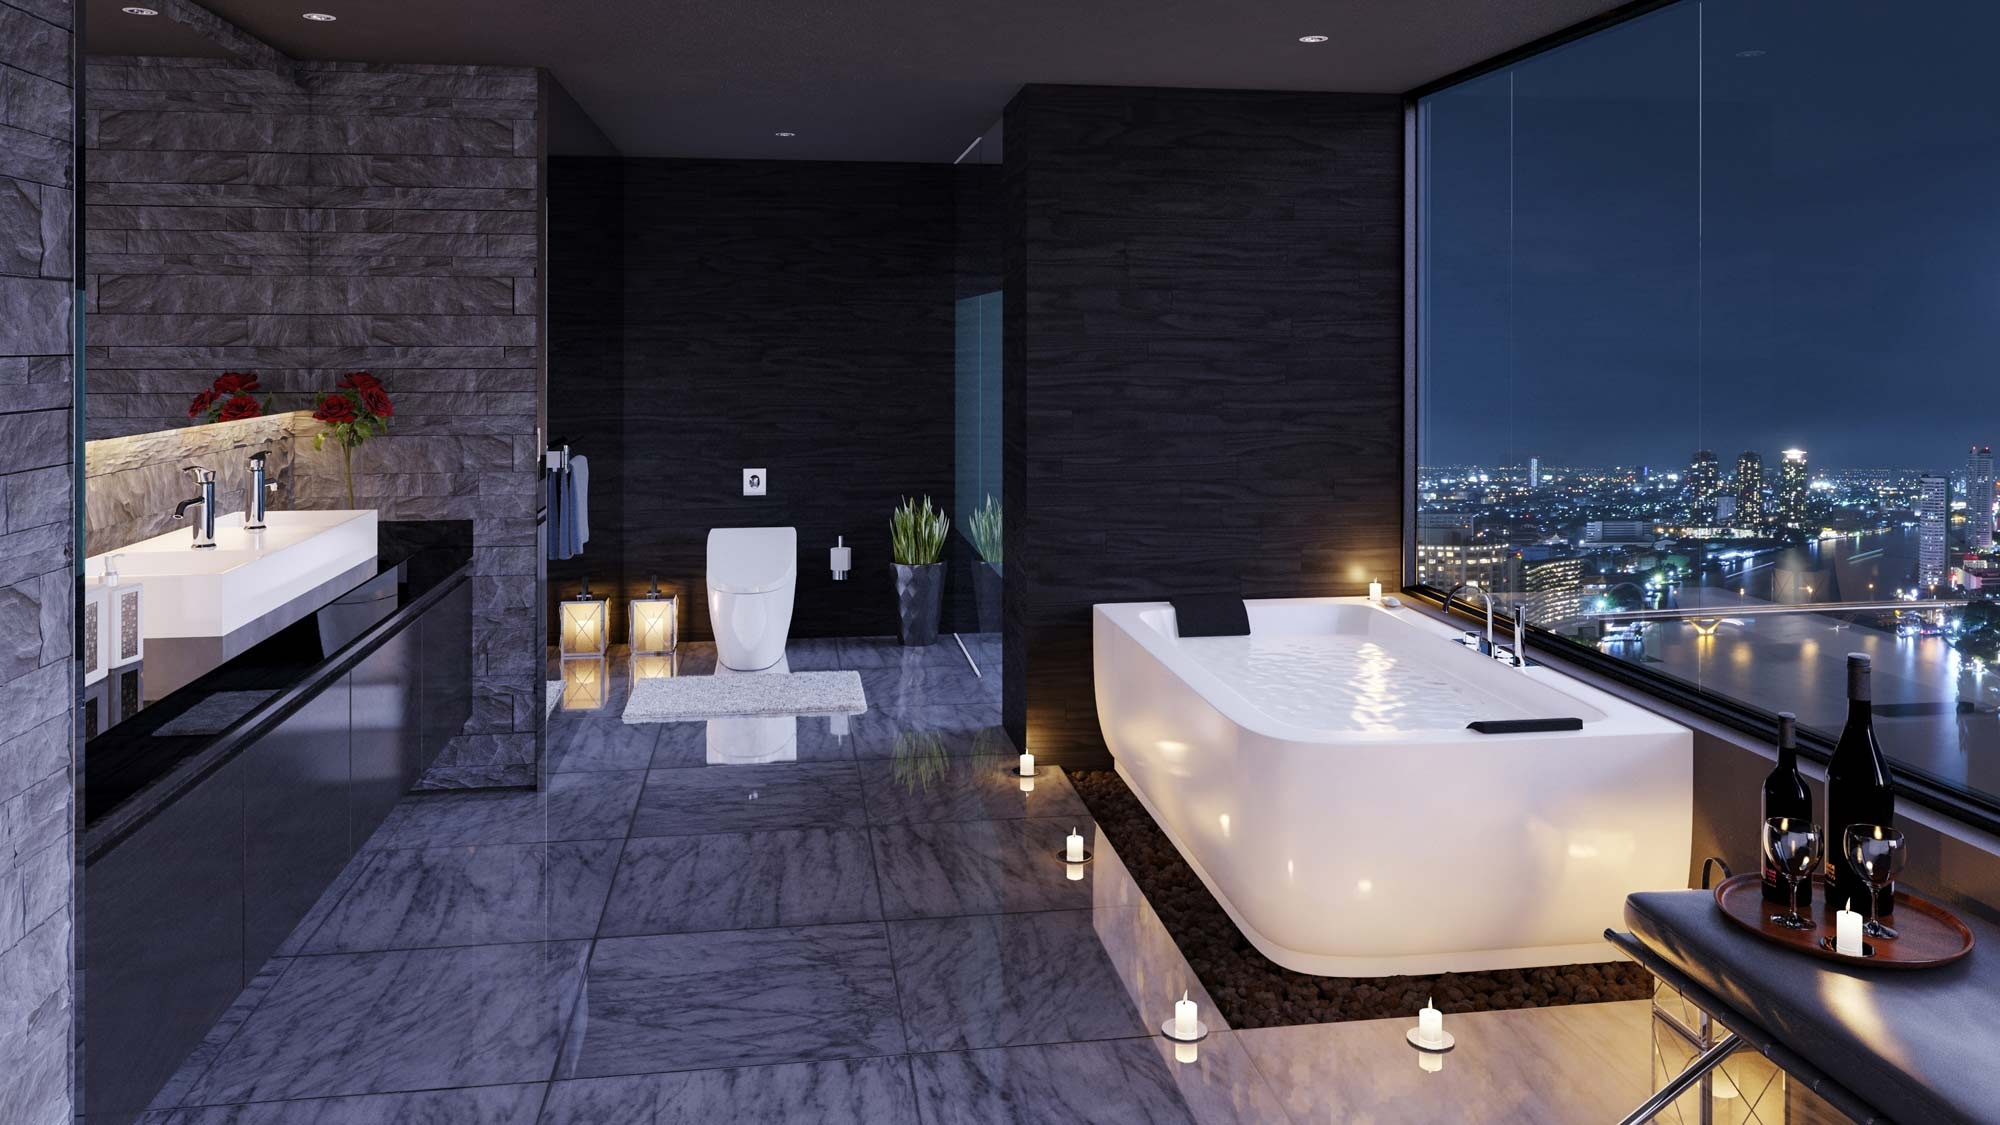 designer valkyrie studio luxury bathroom design ideas news blogrollcenter